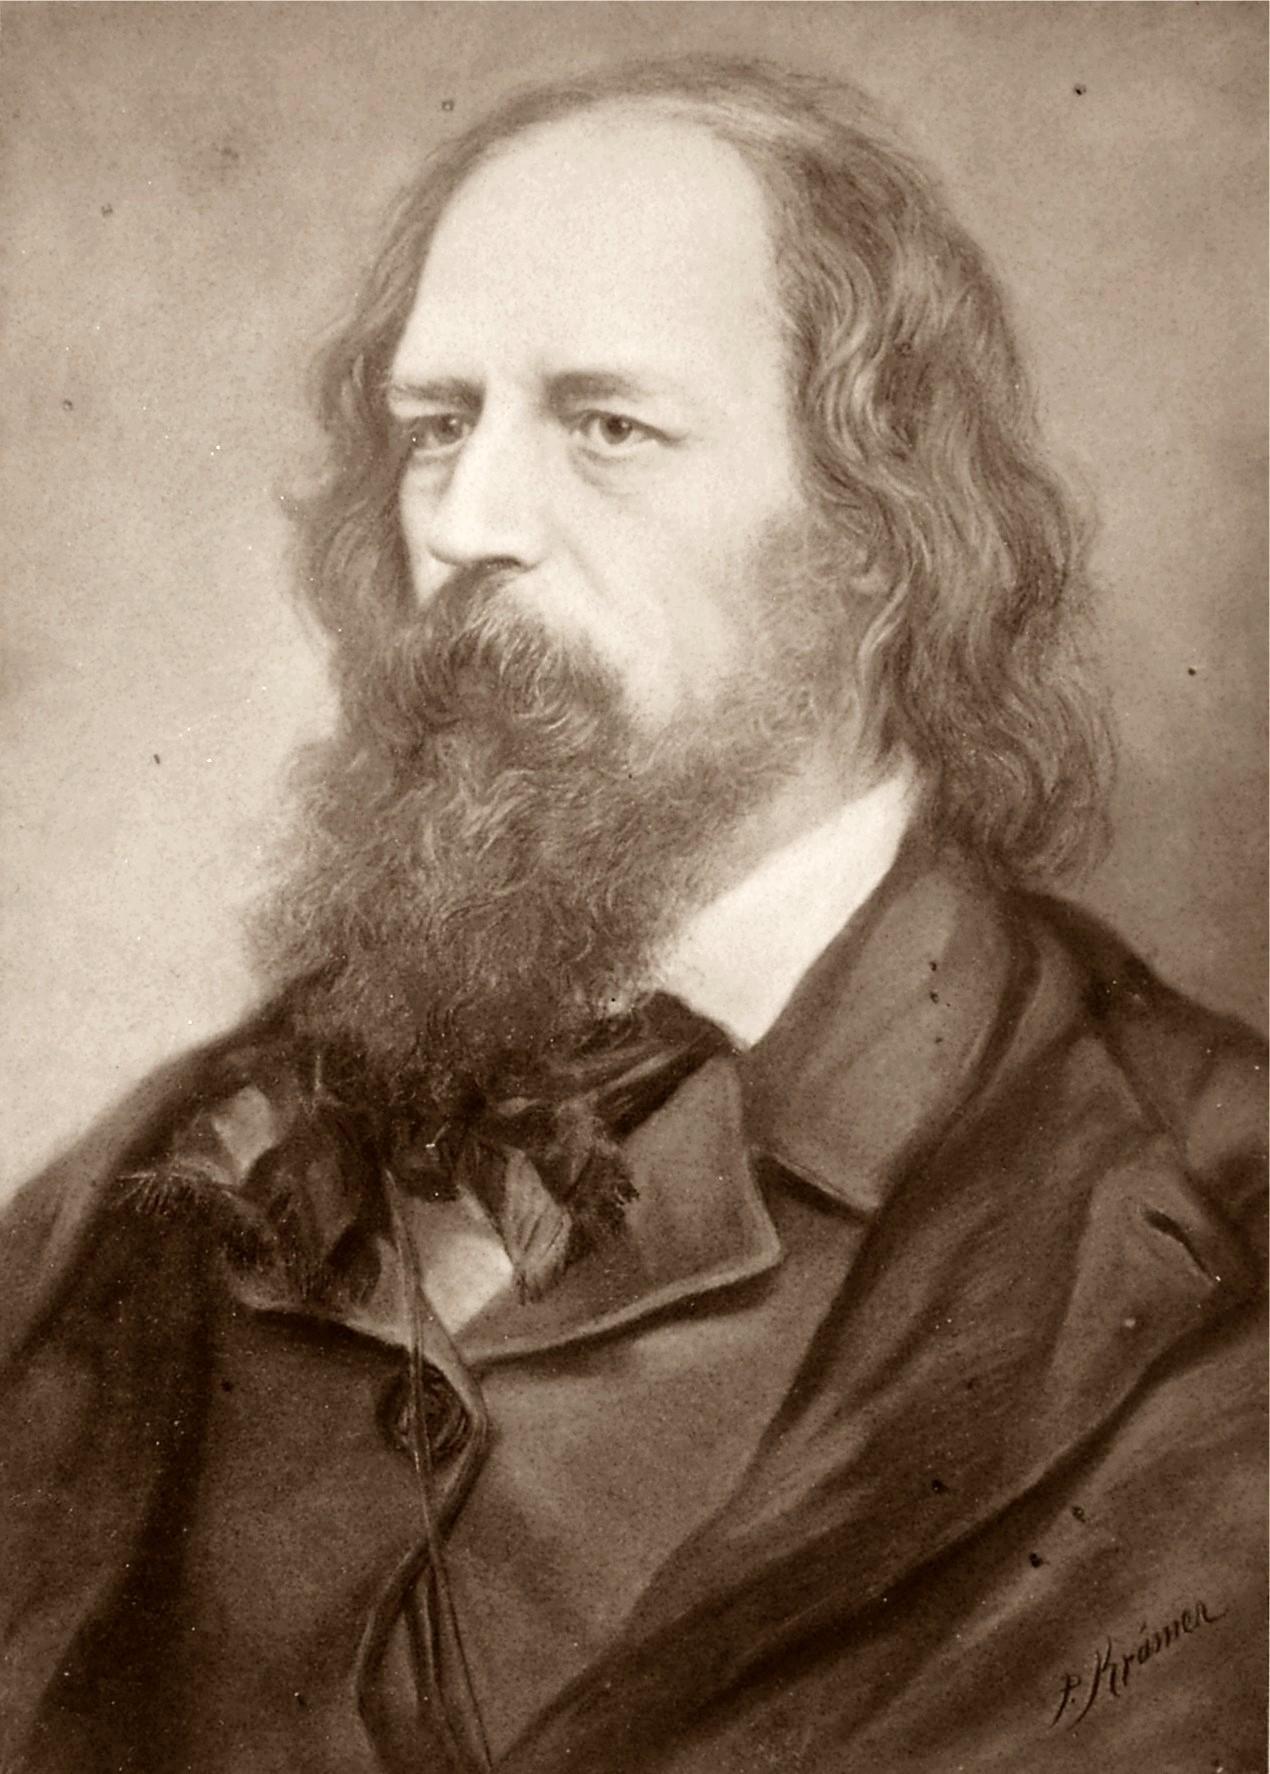 https://upload.wikimedia.org/wikipedia/commons/f/f5/Alfred_Tennyson..jpg